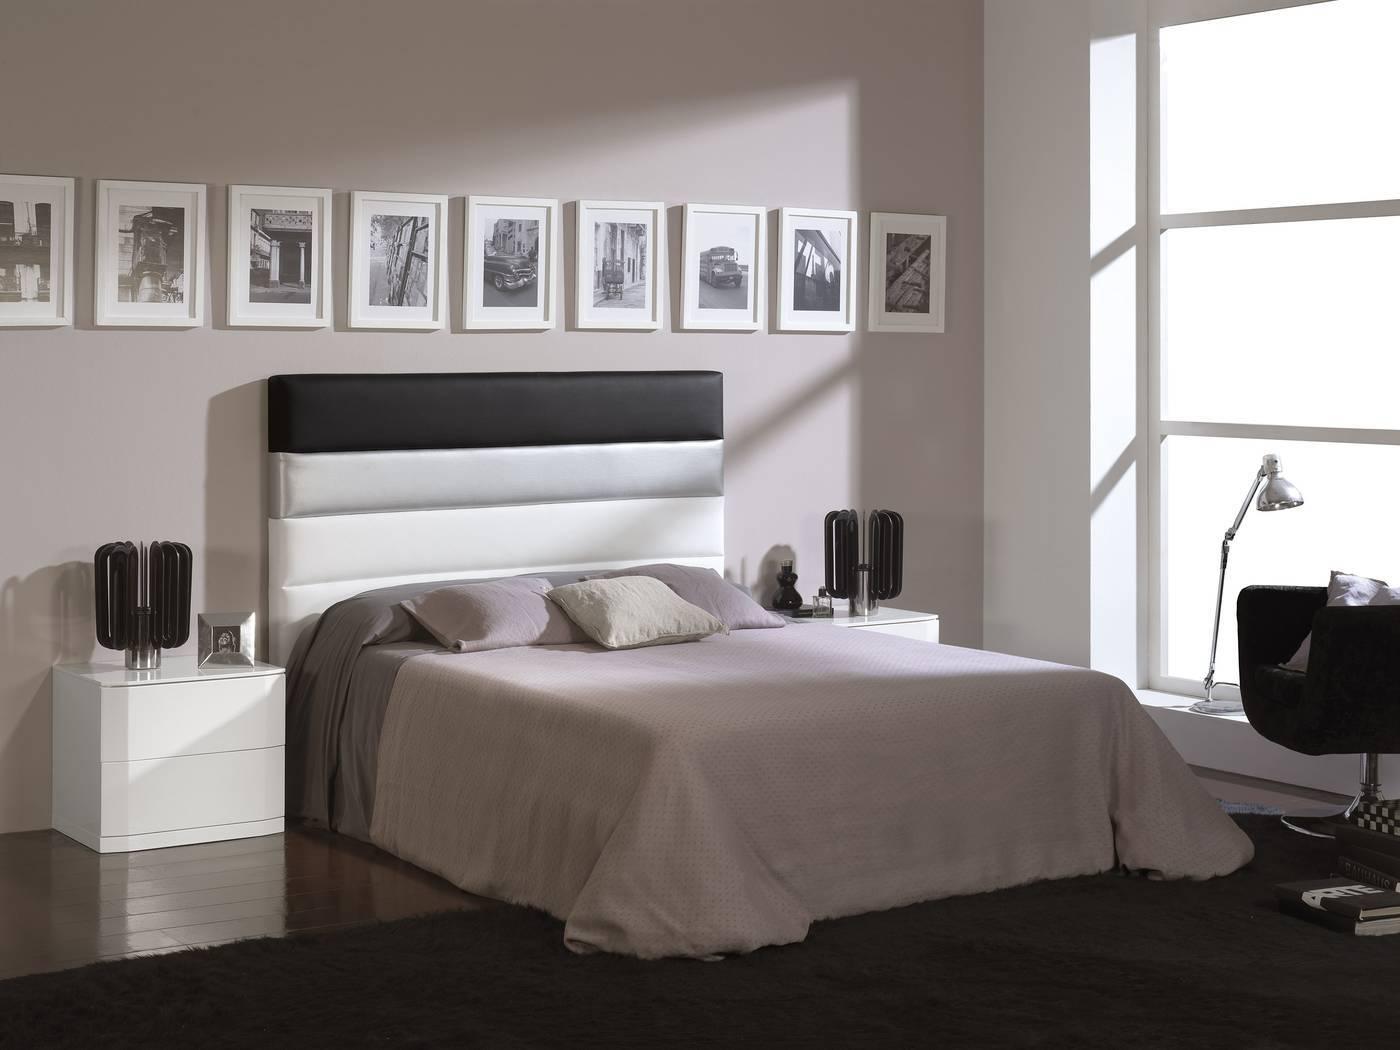 Cabeceros de cama tapizados lamparas sevilla for Cabecero cama 90 blanco